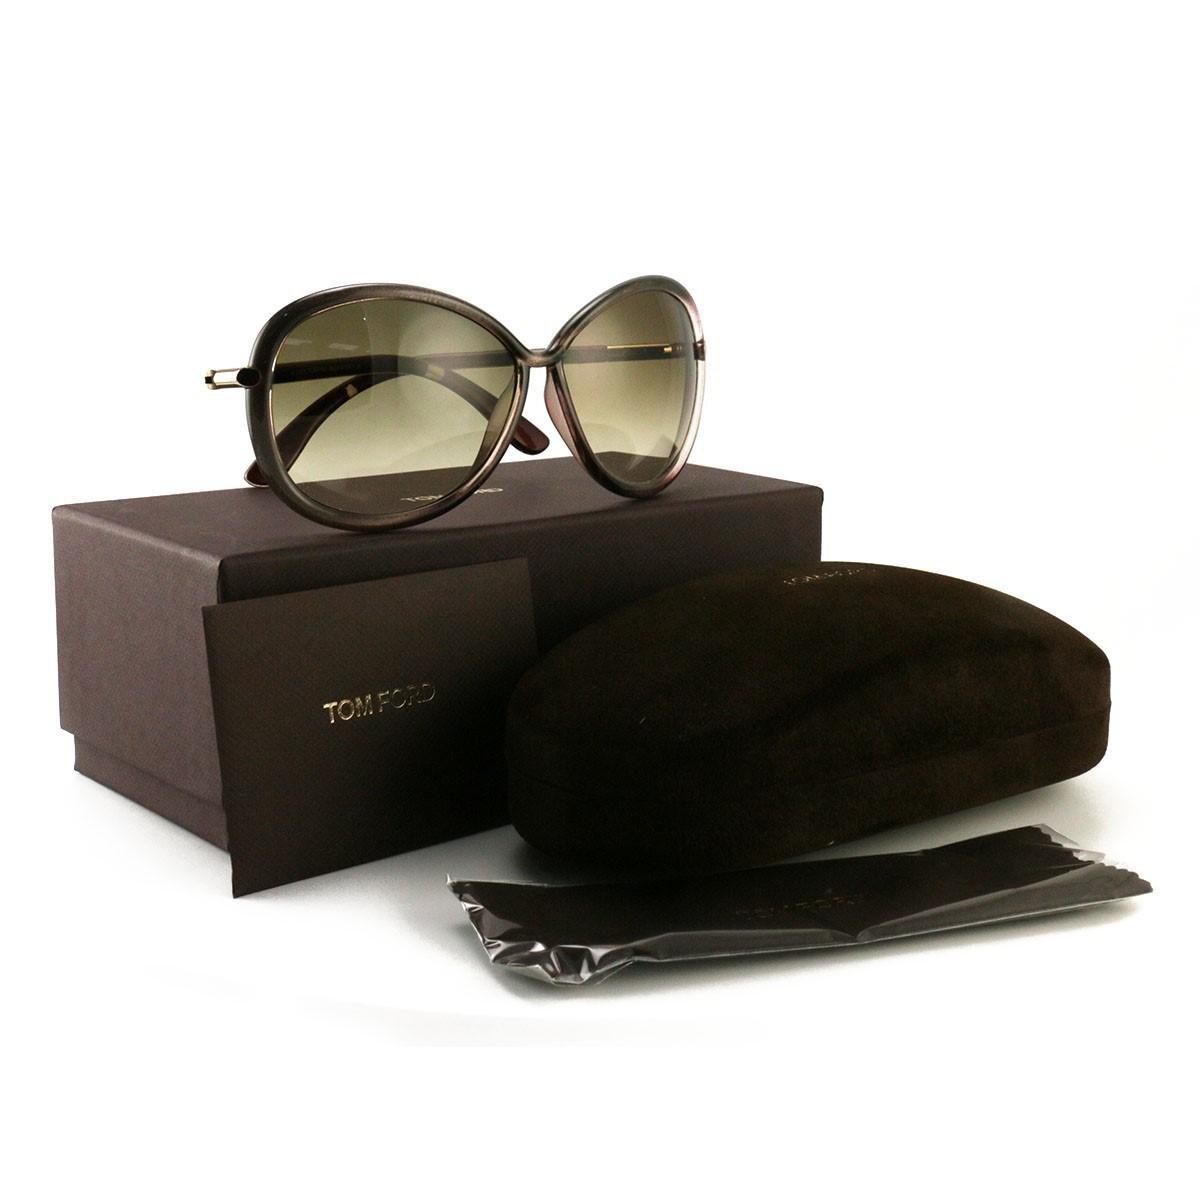 1076e63d198e Lyst - Tom Ford Sunglasses Ft0162 tf016250f Metalized Gray Gold ...